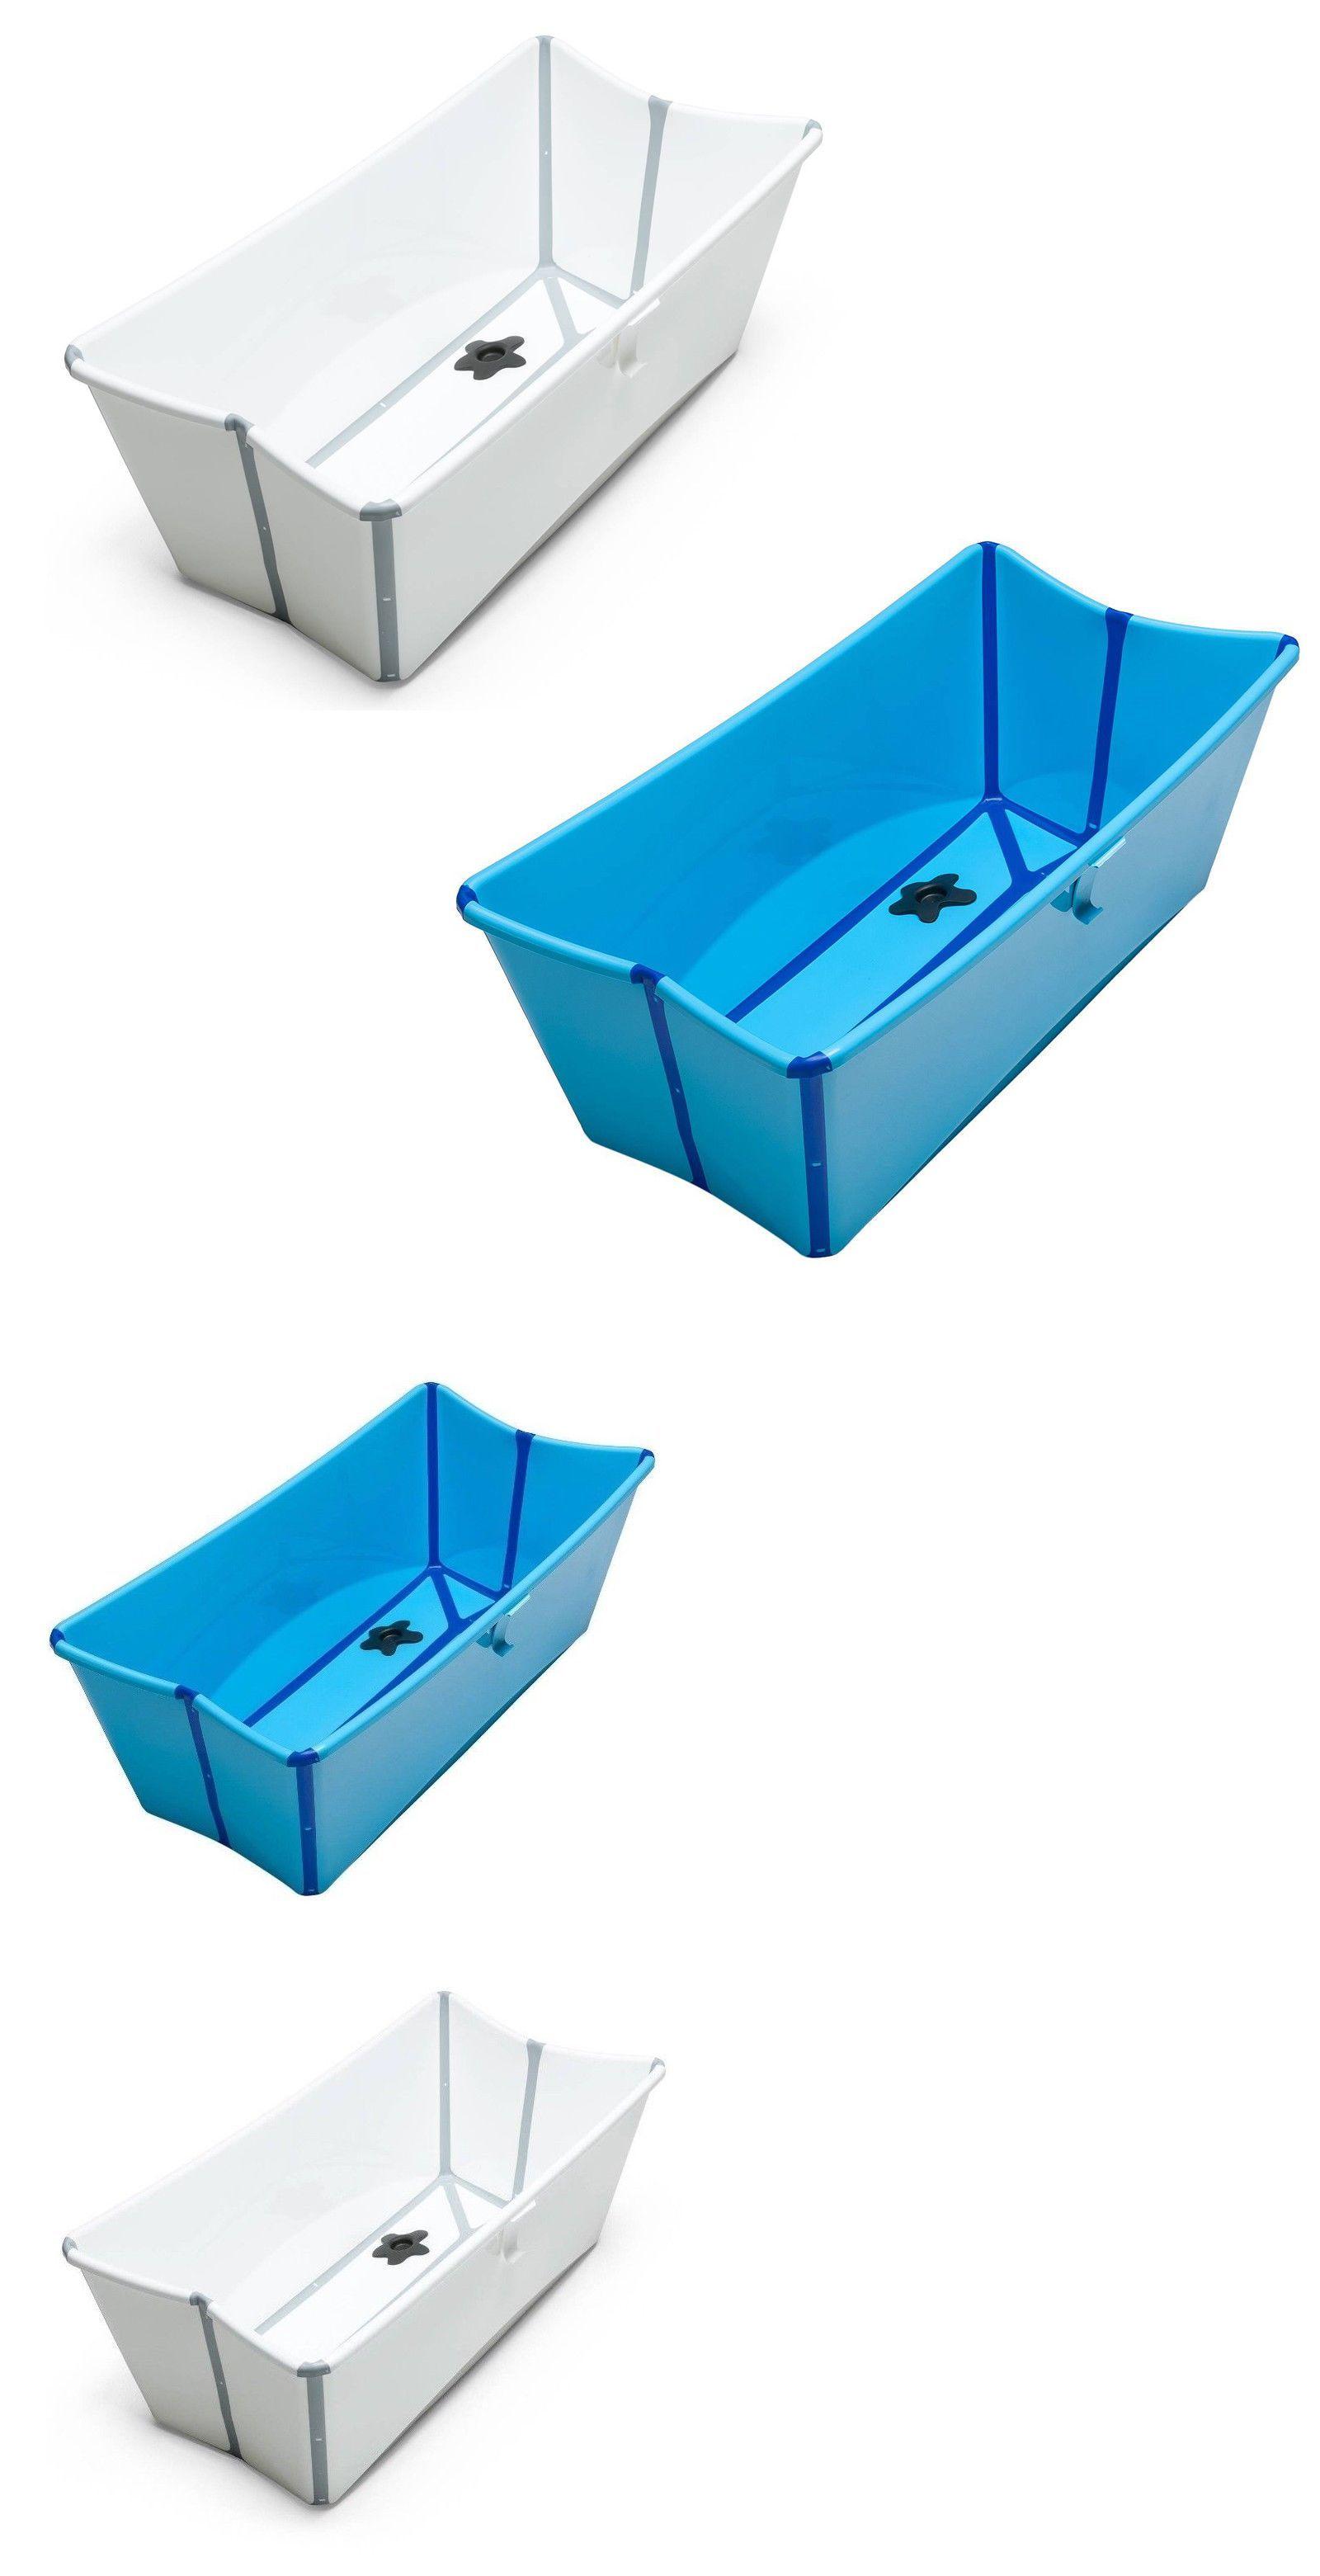 Stokke Flexible Foldable Baby Bath | Pinterest | Bath and Babies